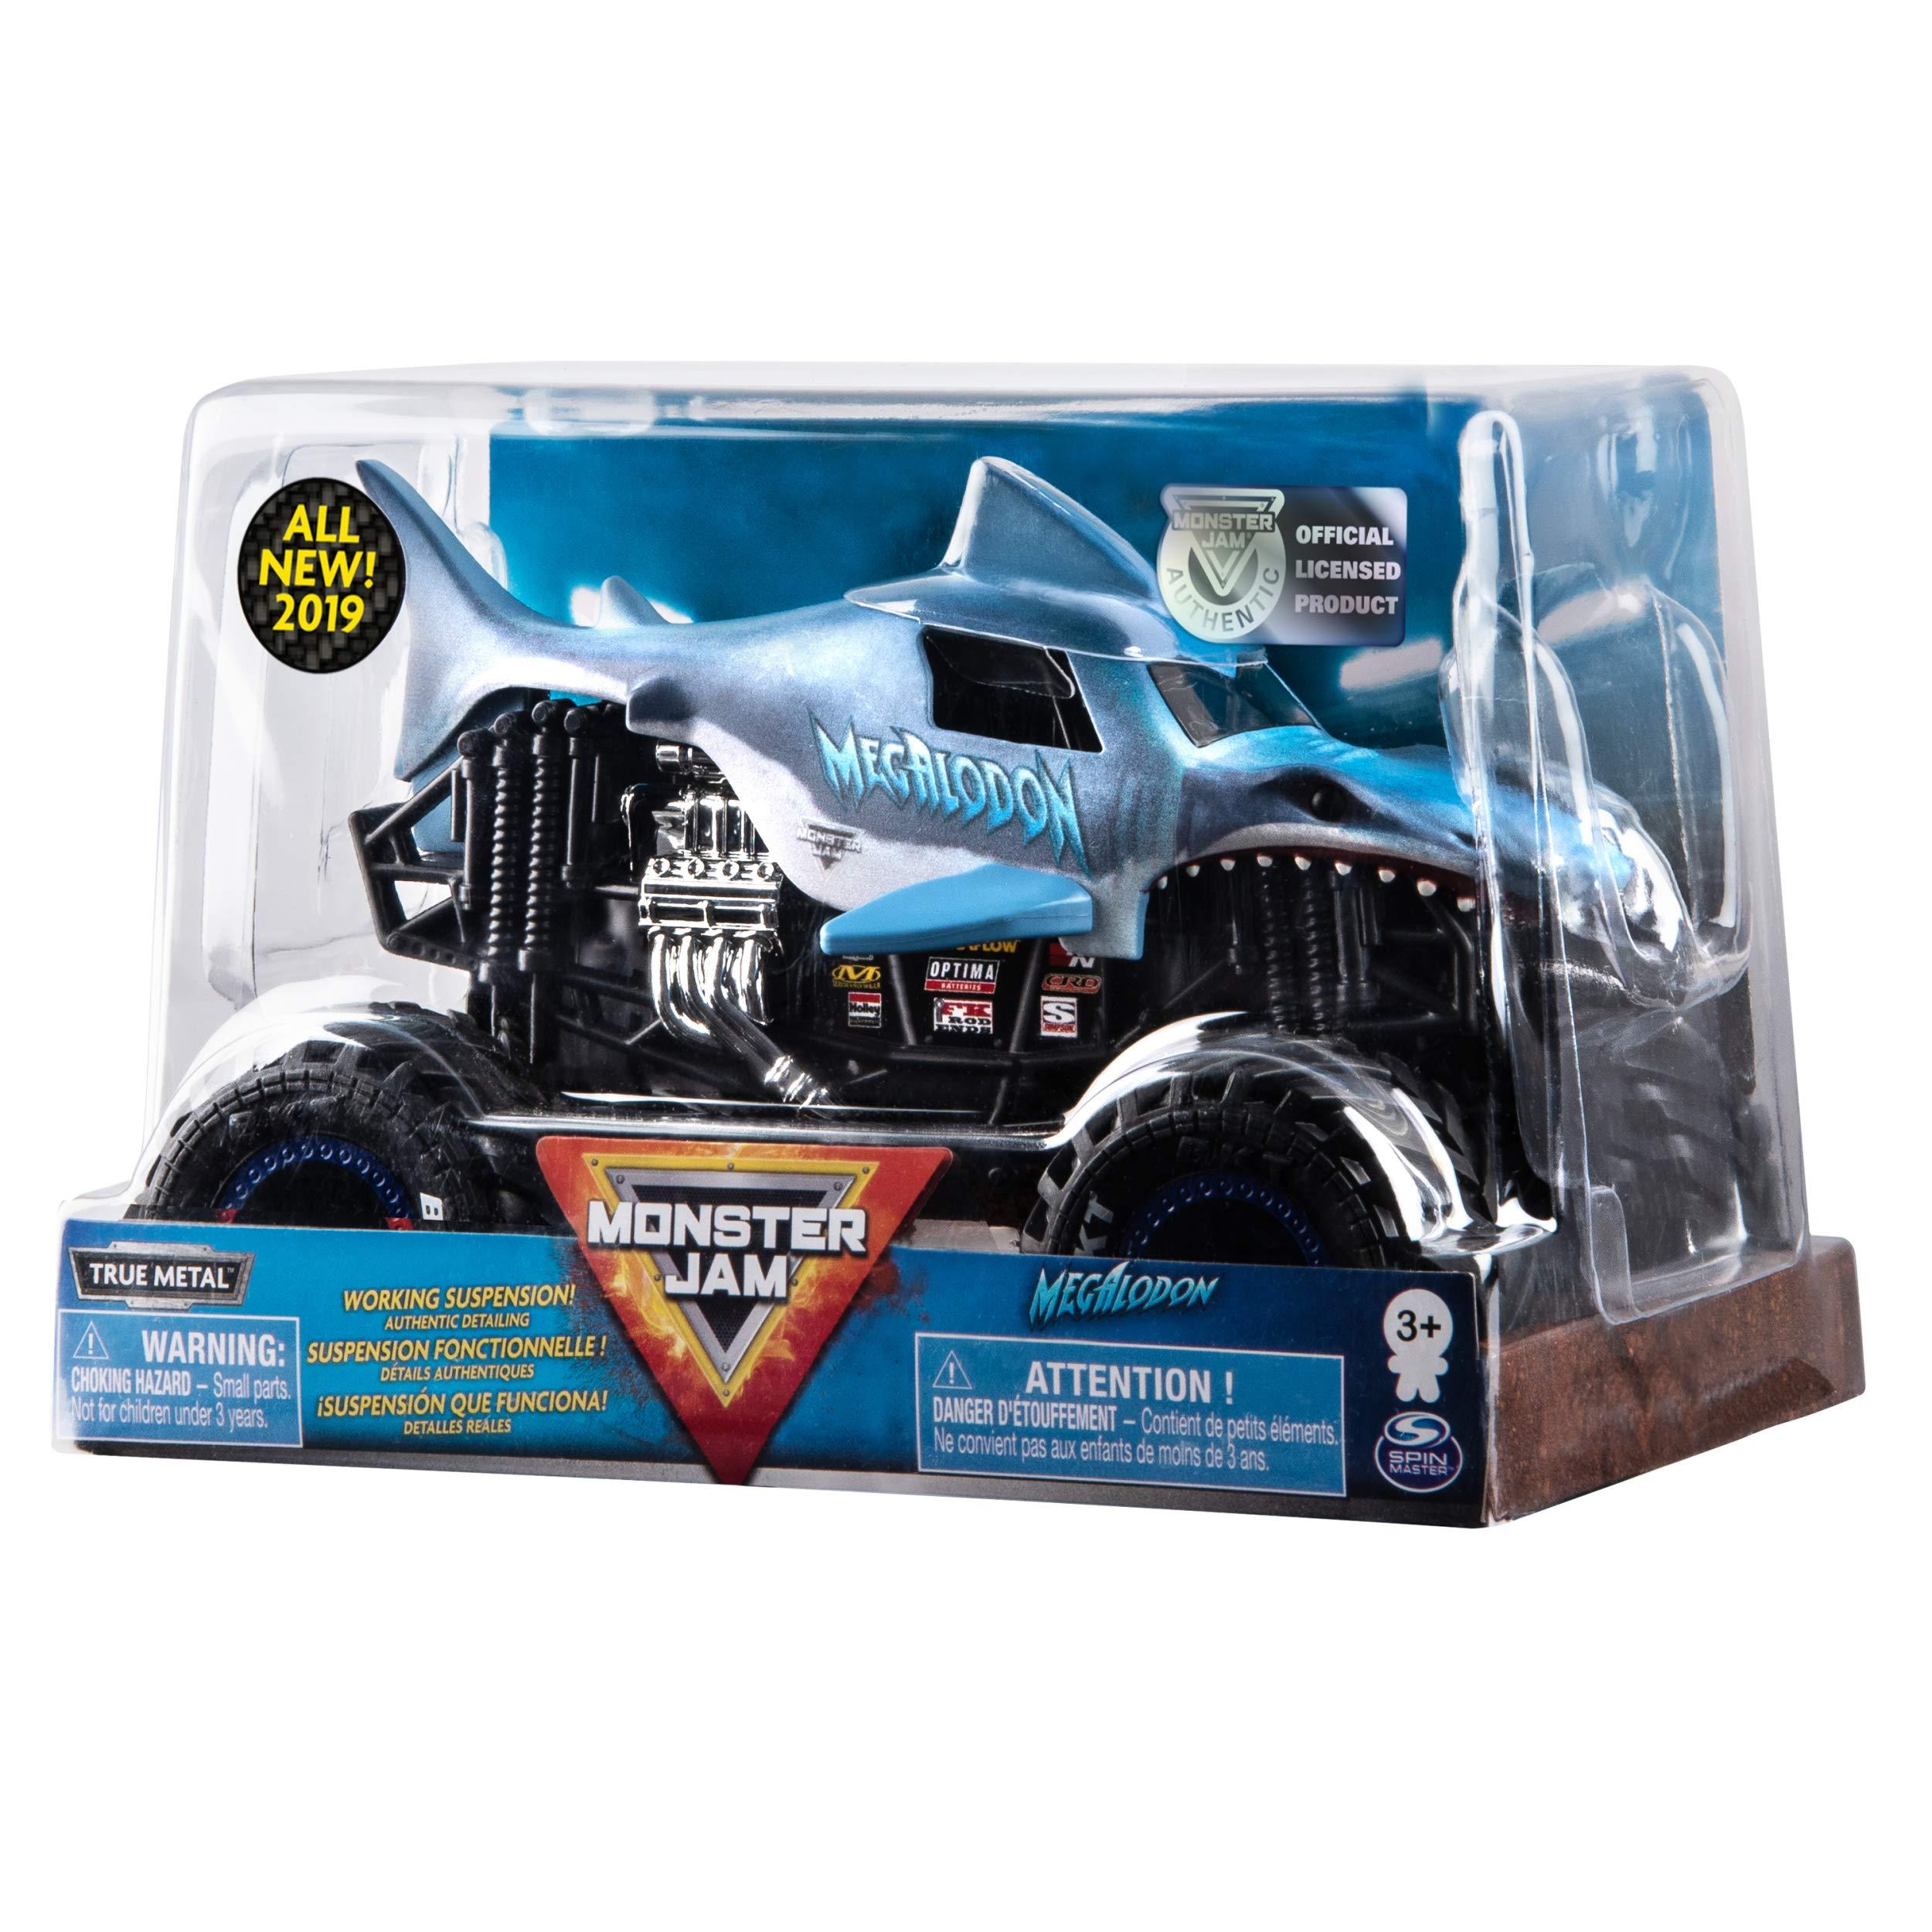 Monster Jam Official Megladon Monster Truck, Die-Cast Vehicle 1:24 Scale by Monster Jam (Image #5)